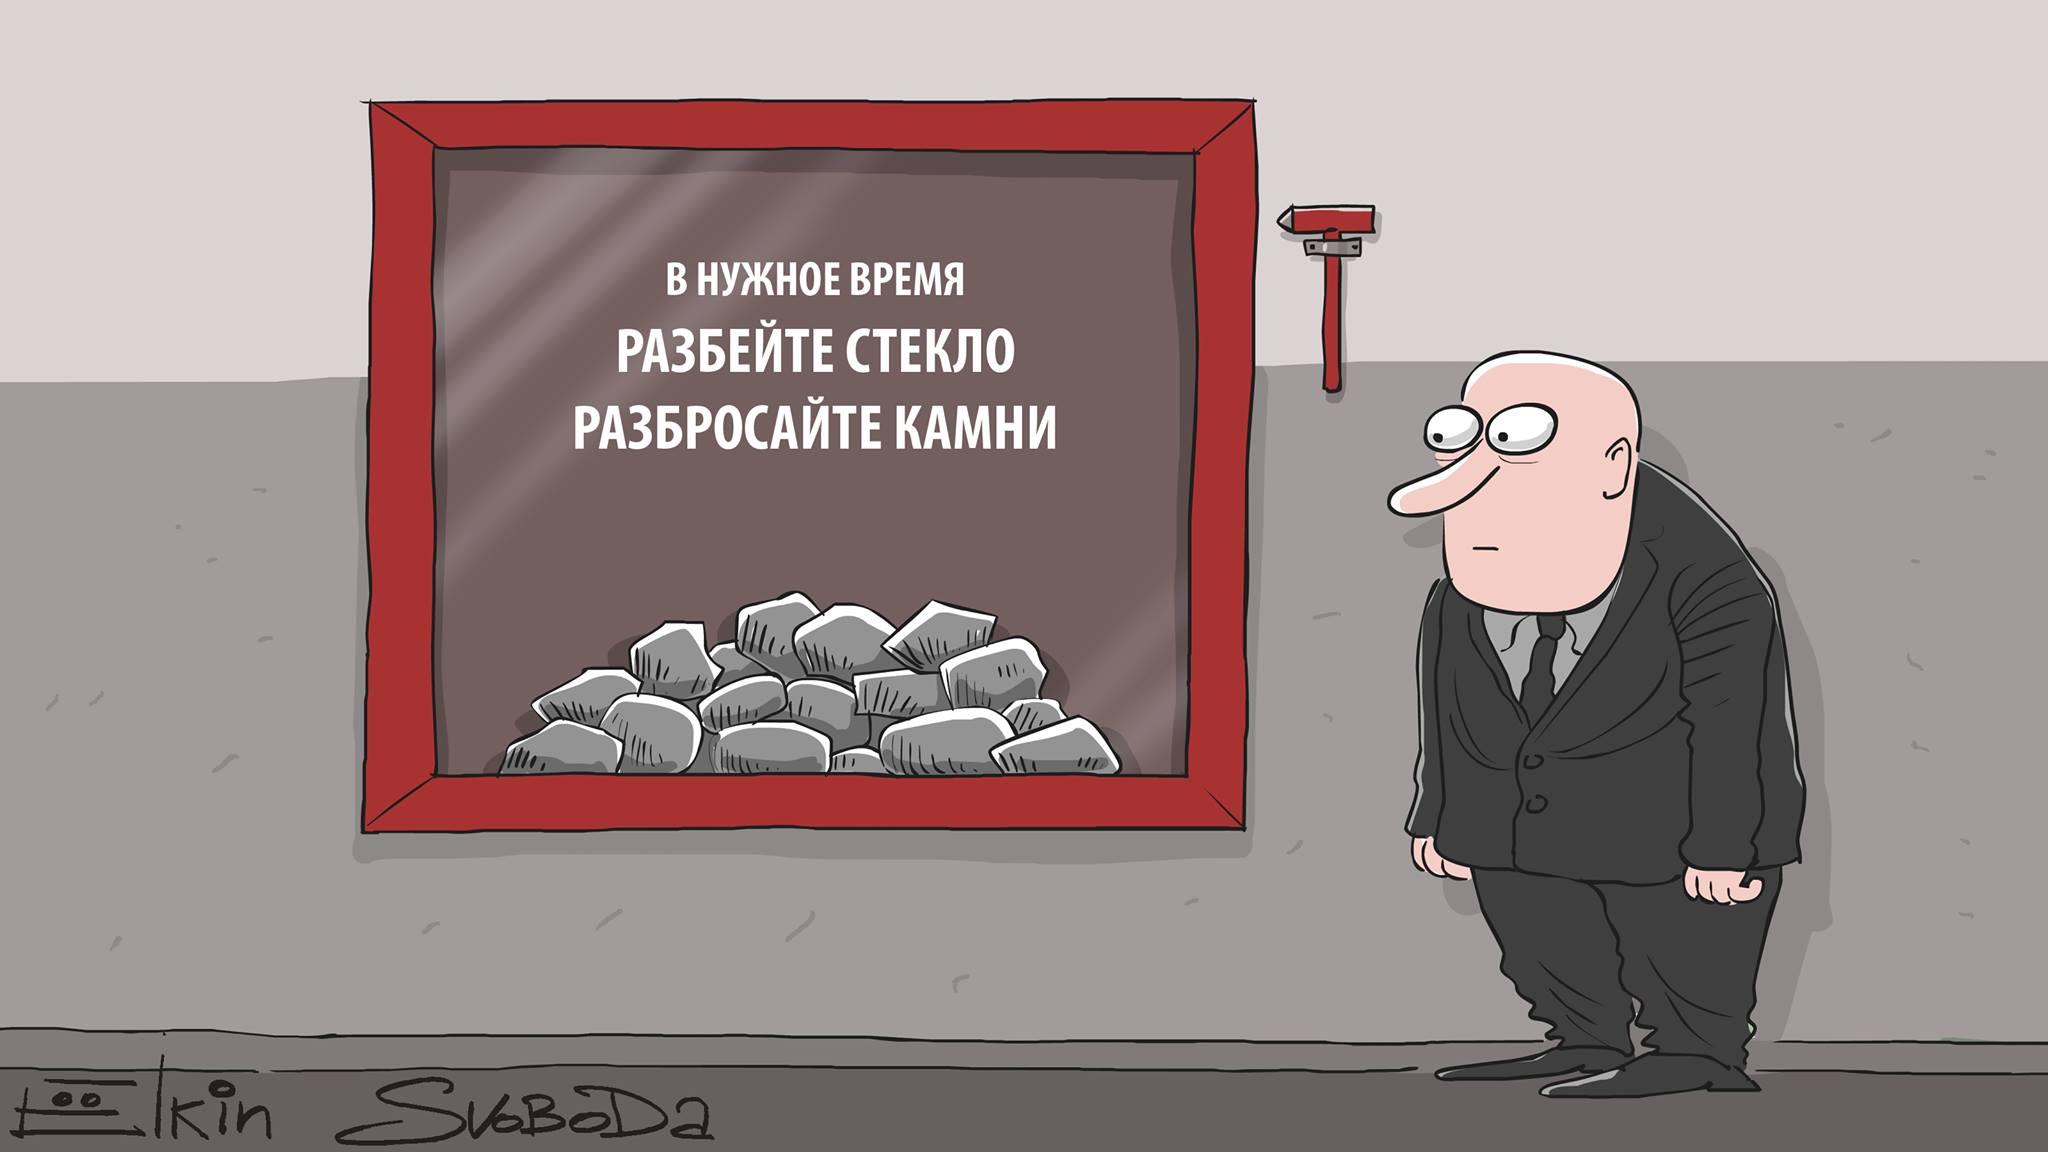 http://s4.uploads.ru/1GrwK.jpg